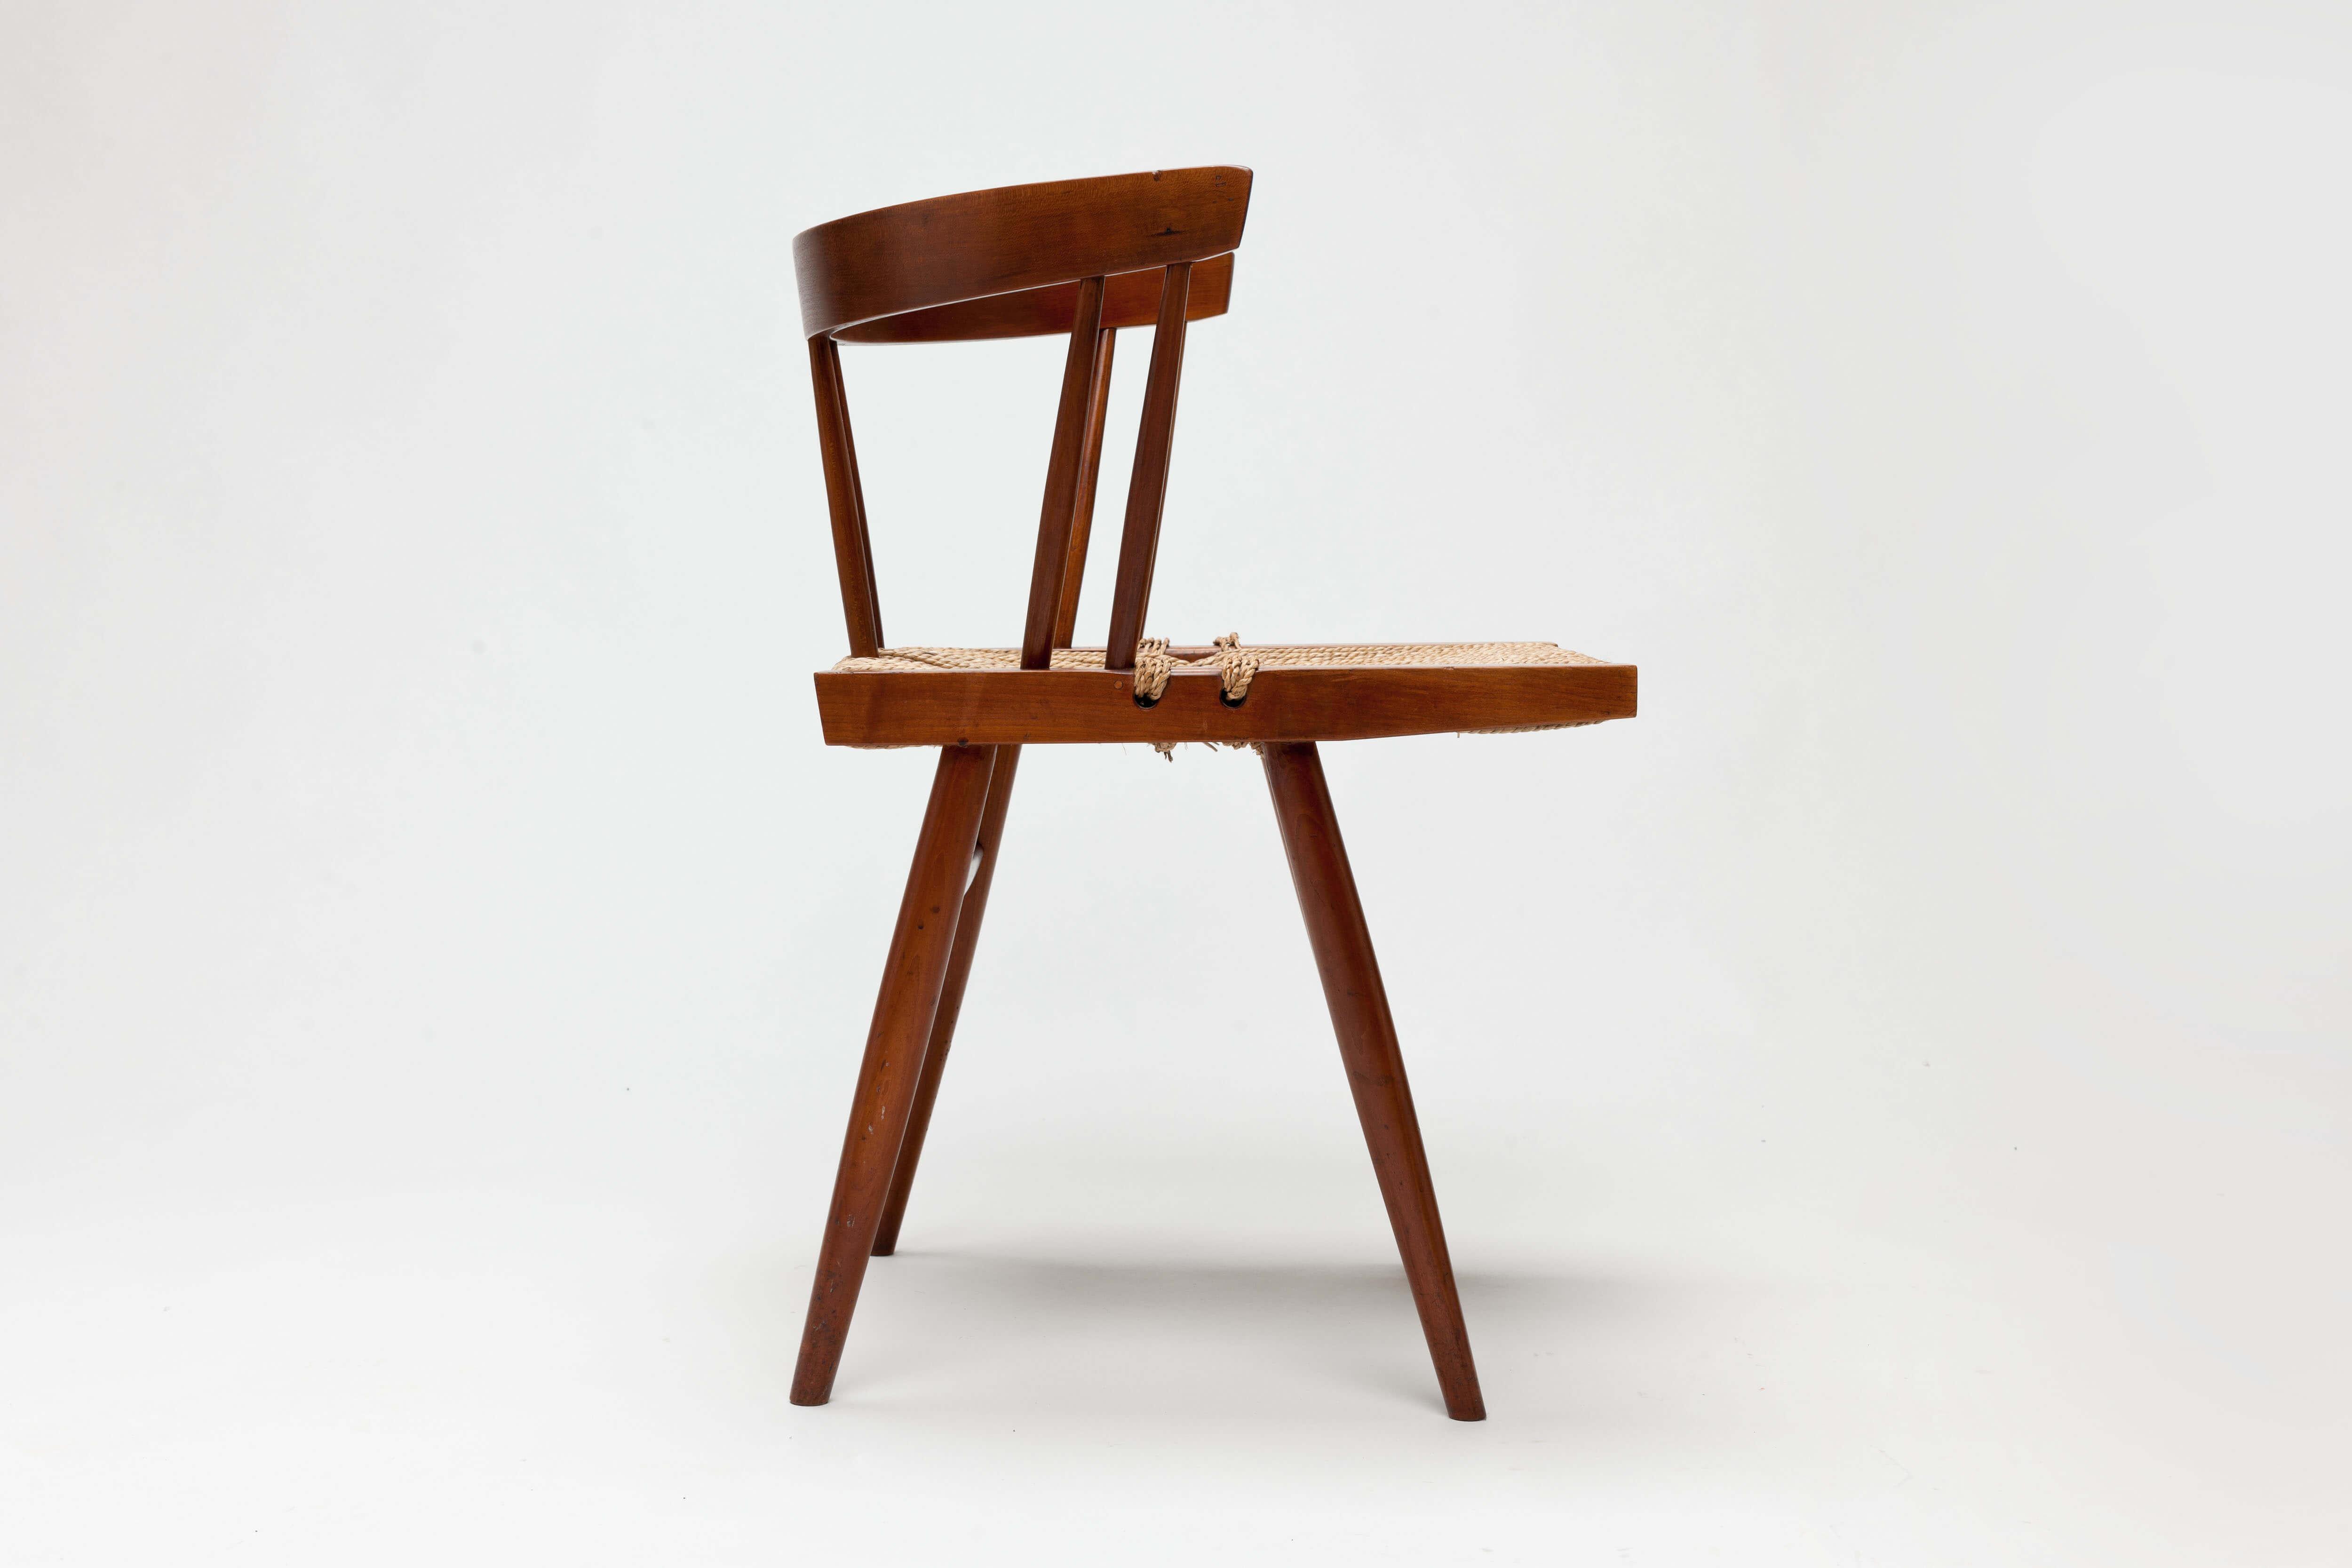 Vintage George Nakashima Grass Chair